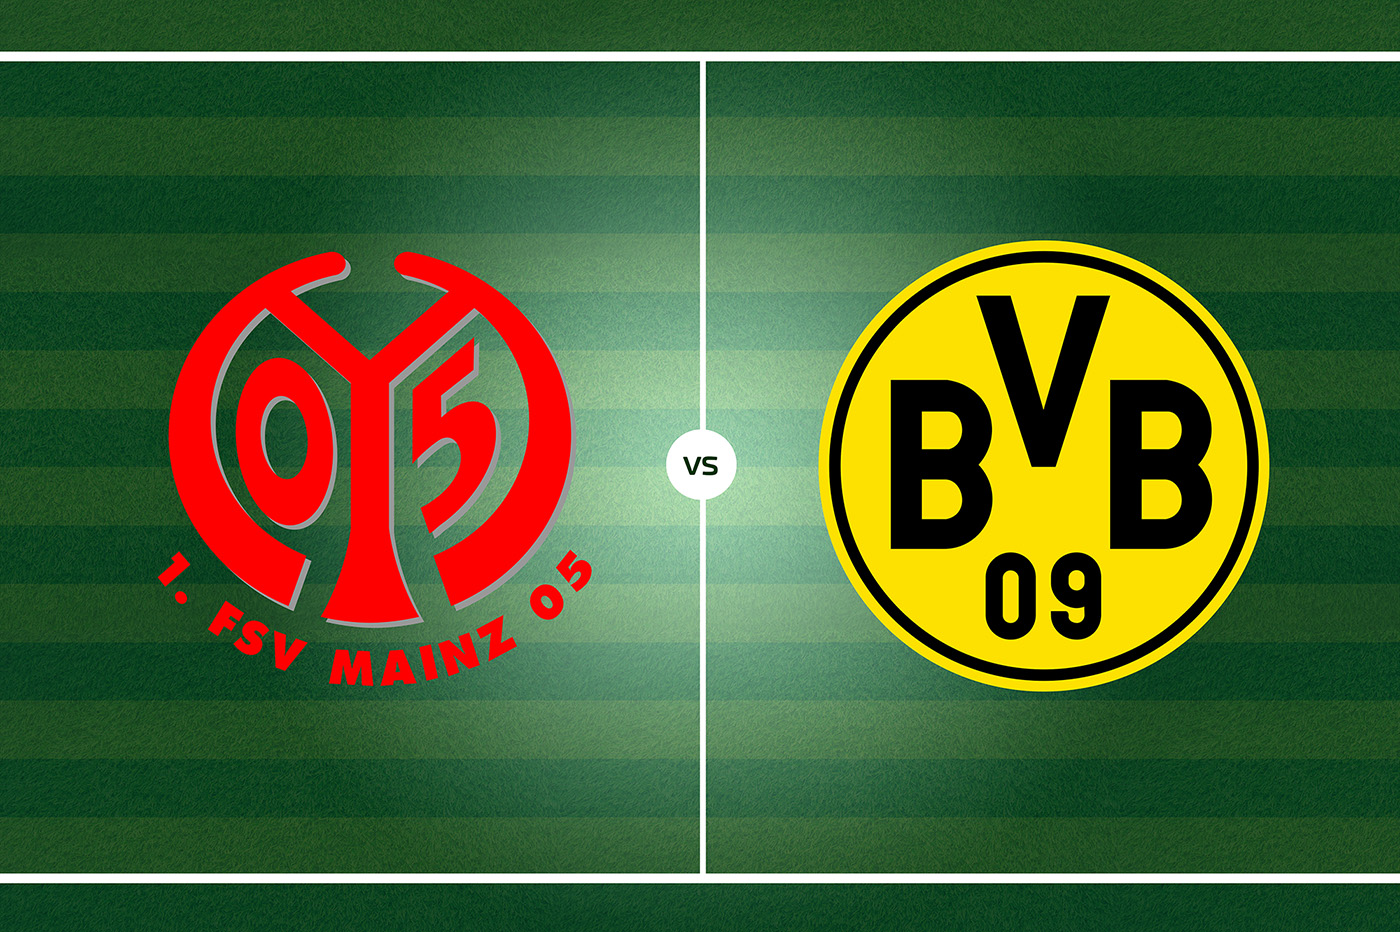 Fussball Bundesliga 1 Fsv Mainz 05 Vs Borussia Dortmund Wagrati